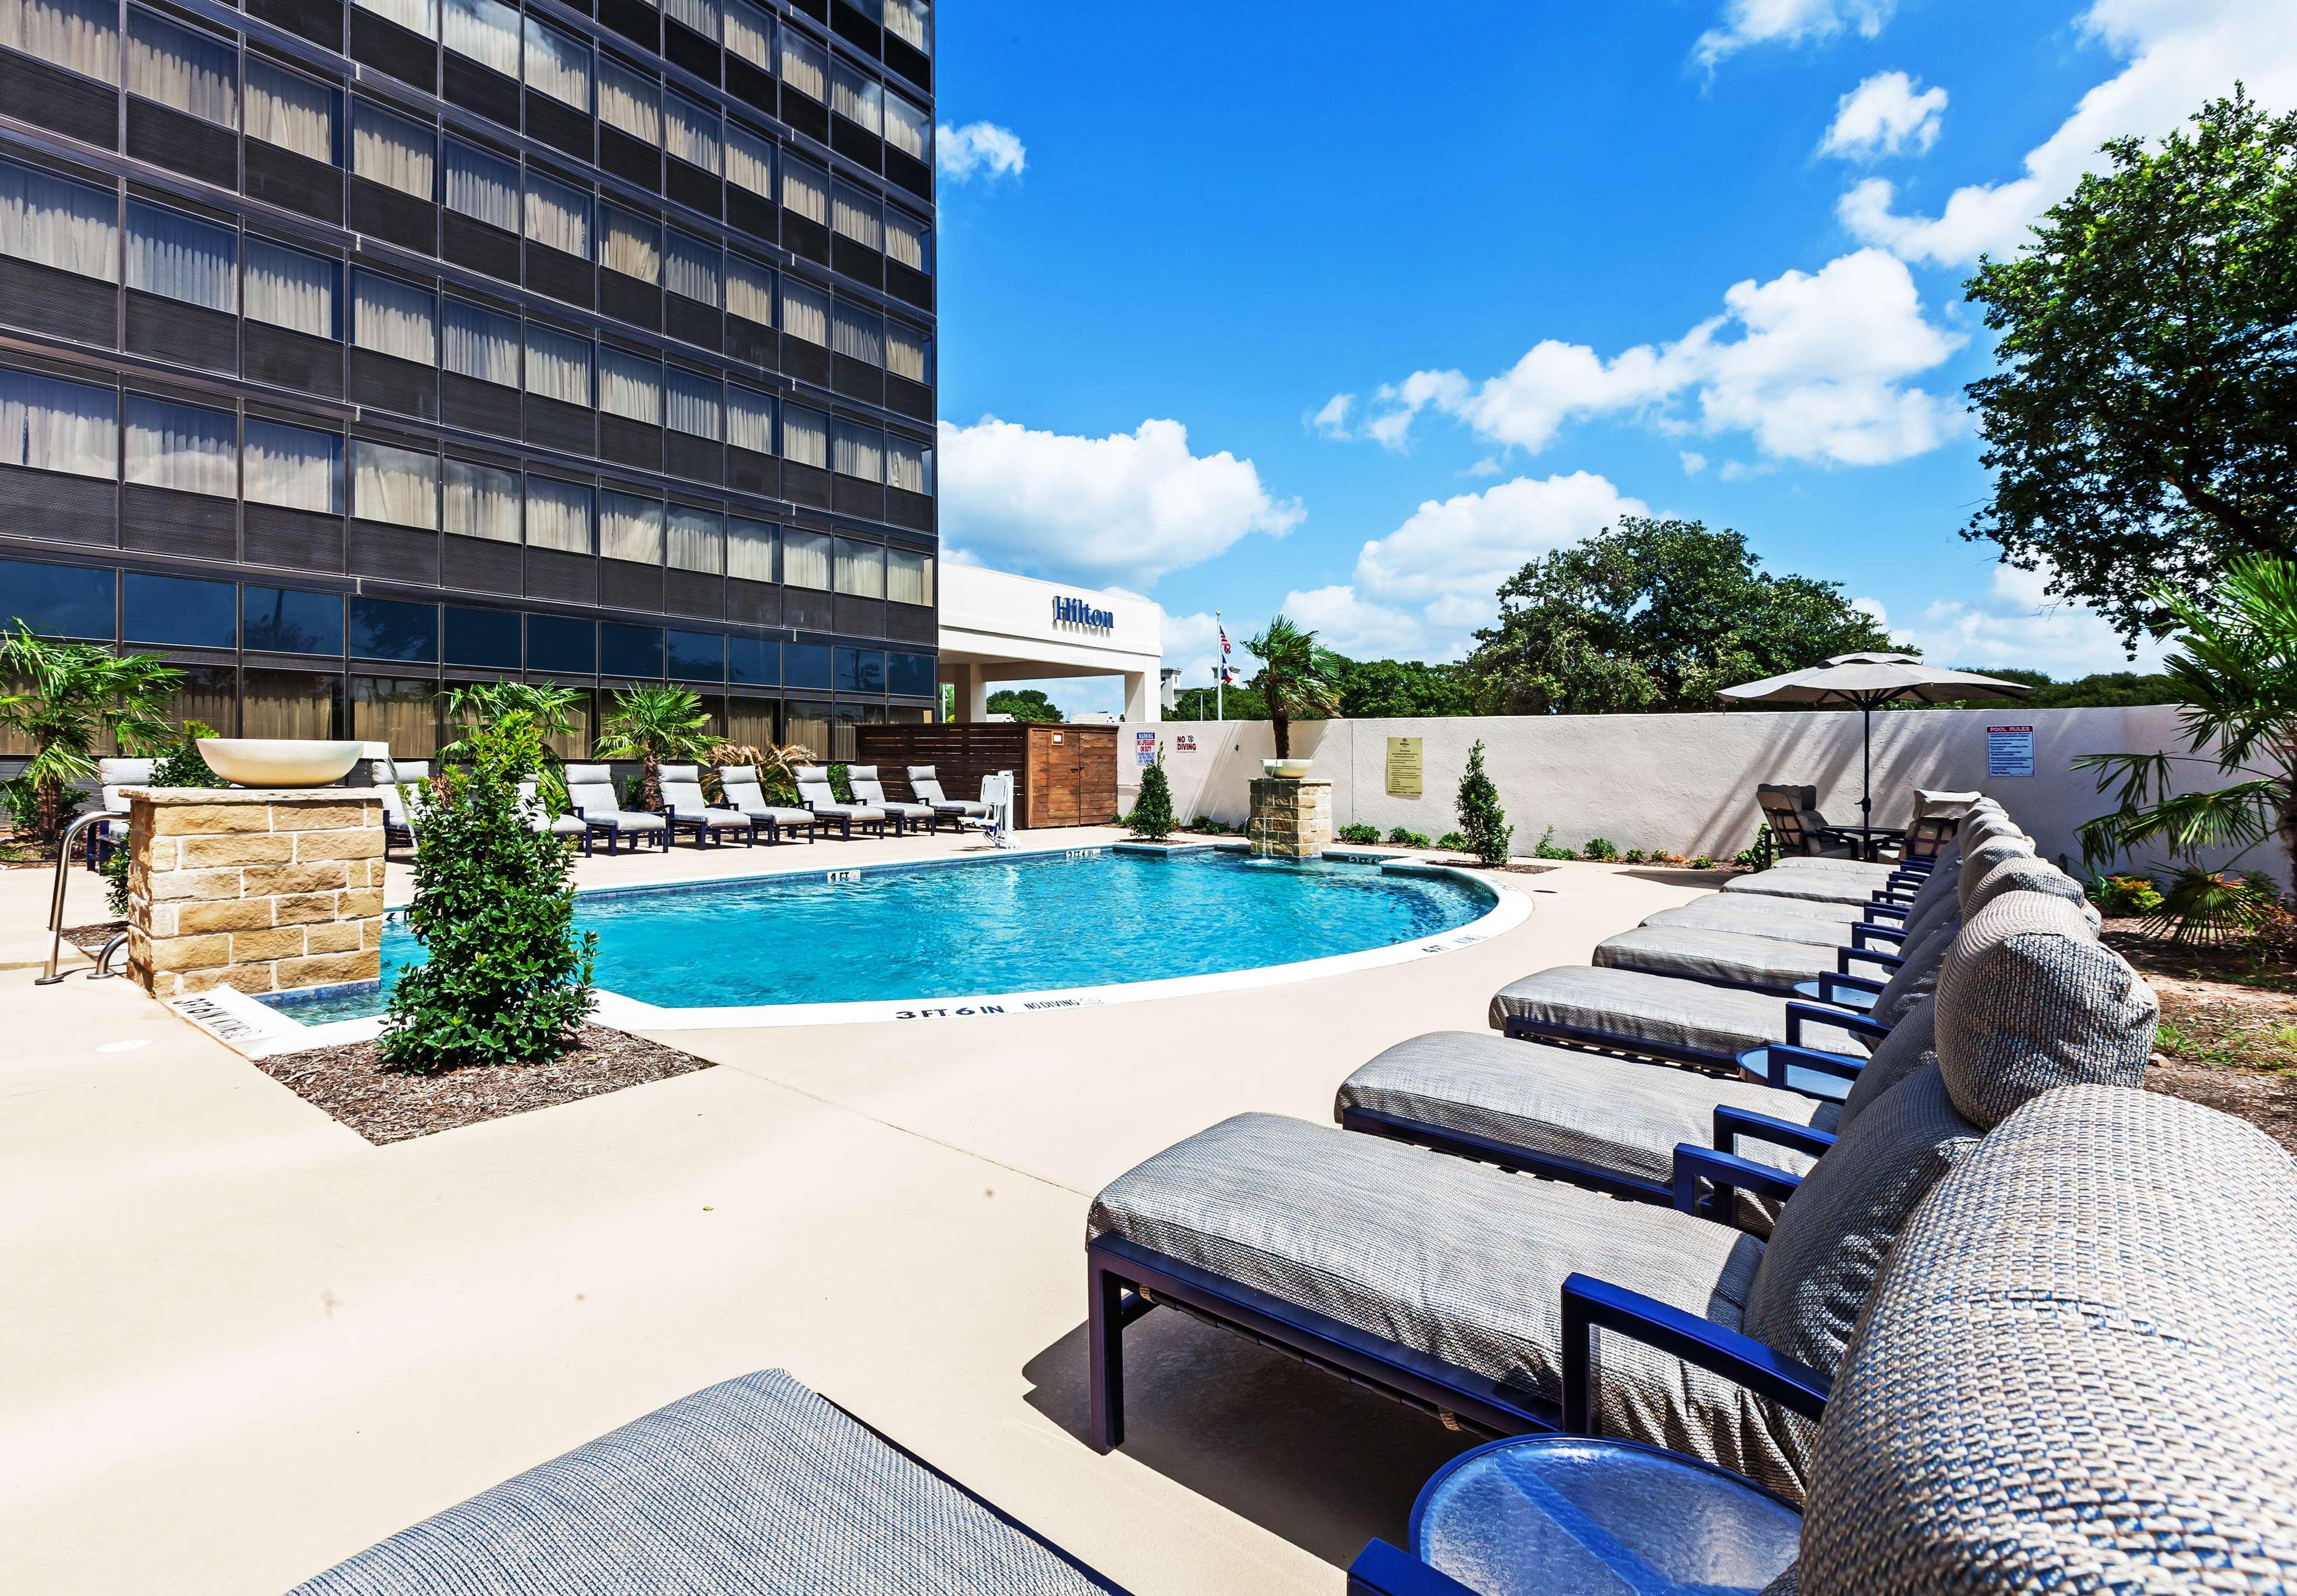 Hilton Waco image 22